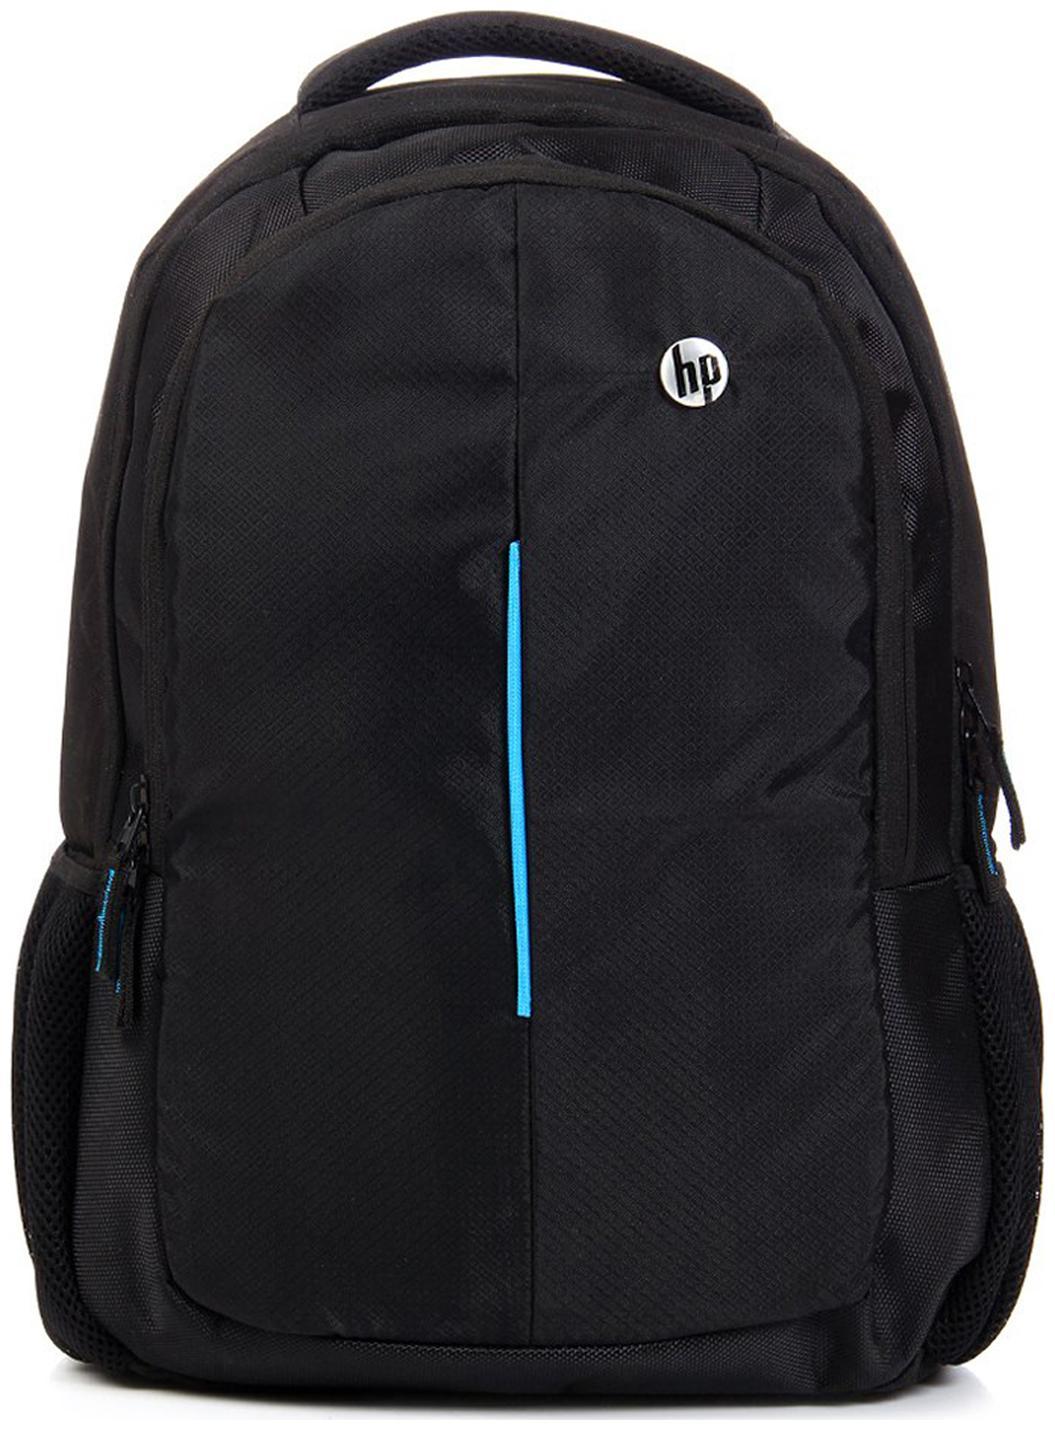 HP Backpack Laptop Backpacks